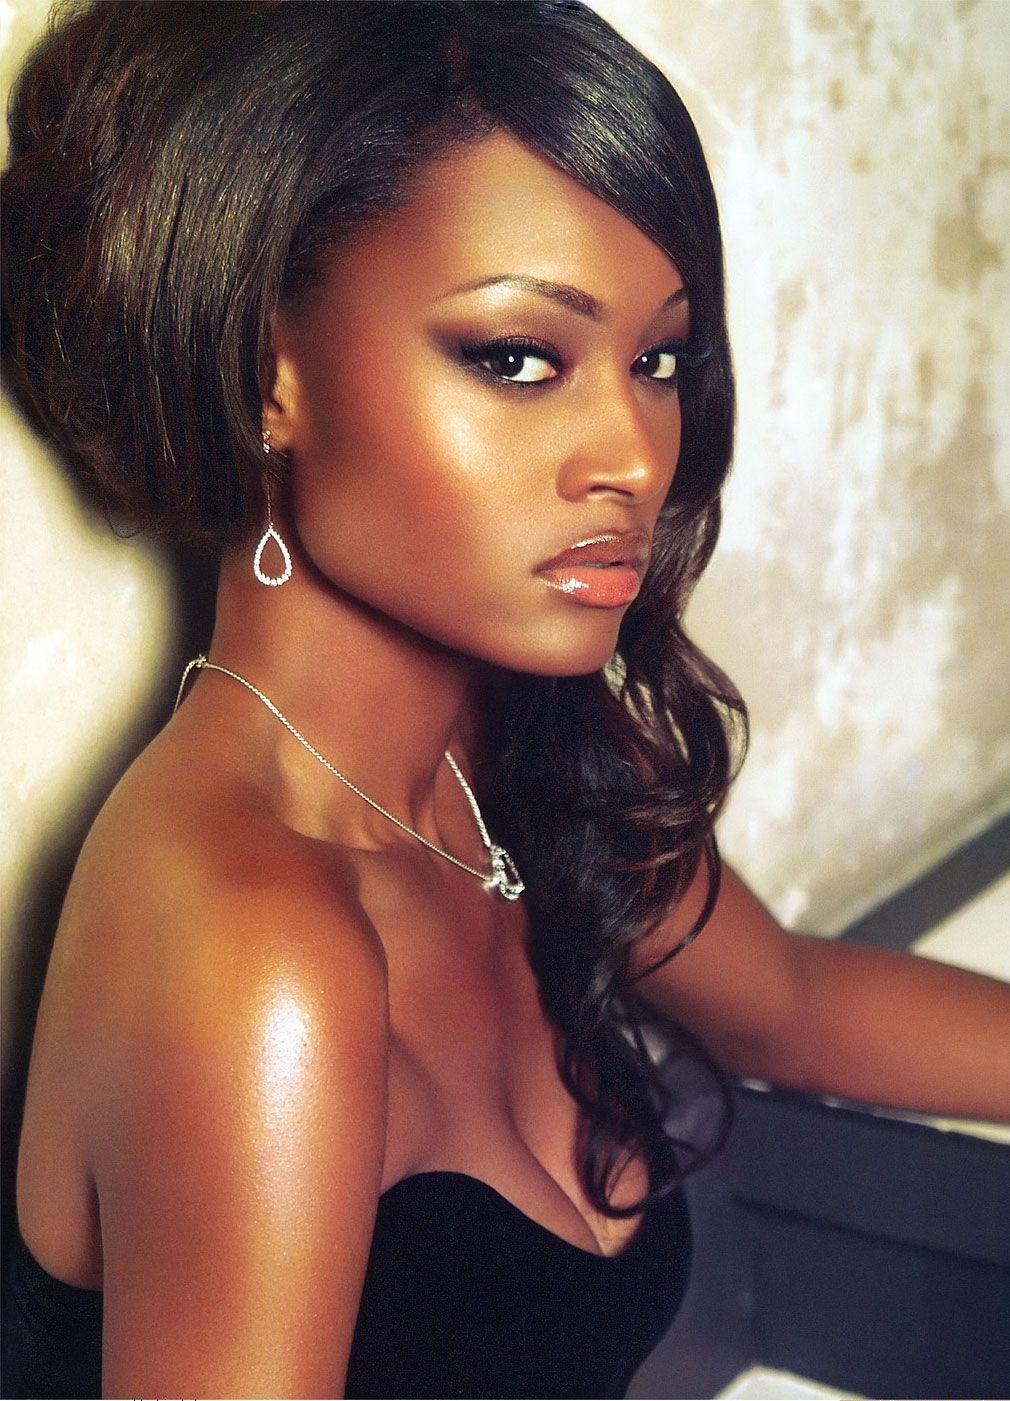 Ebony beauty models